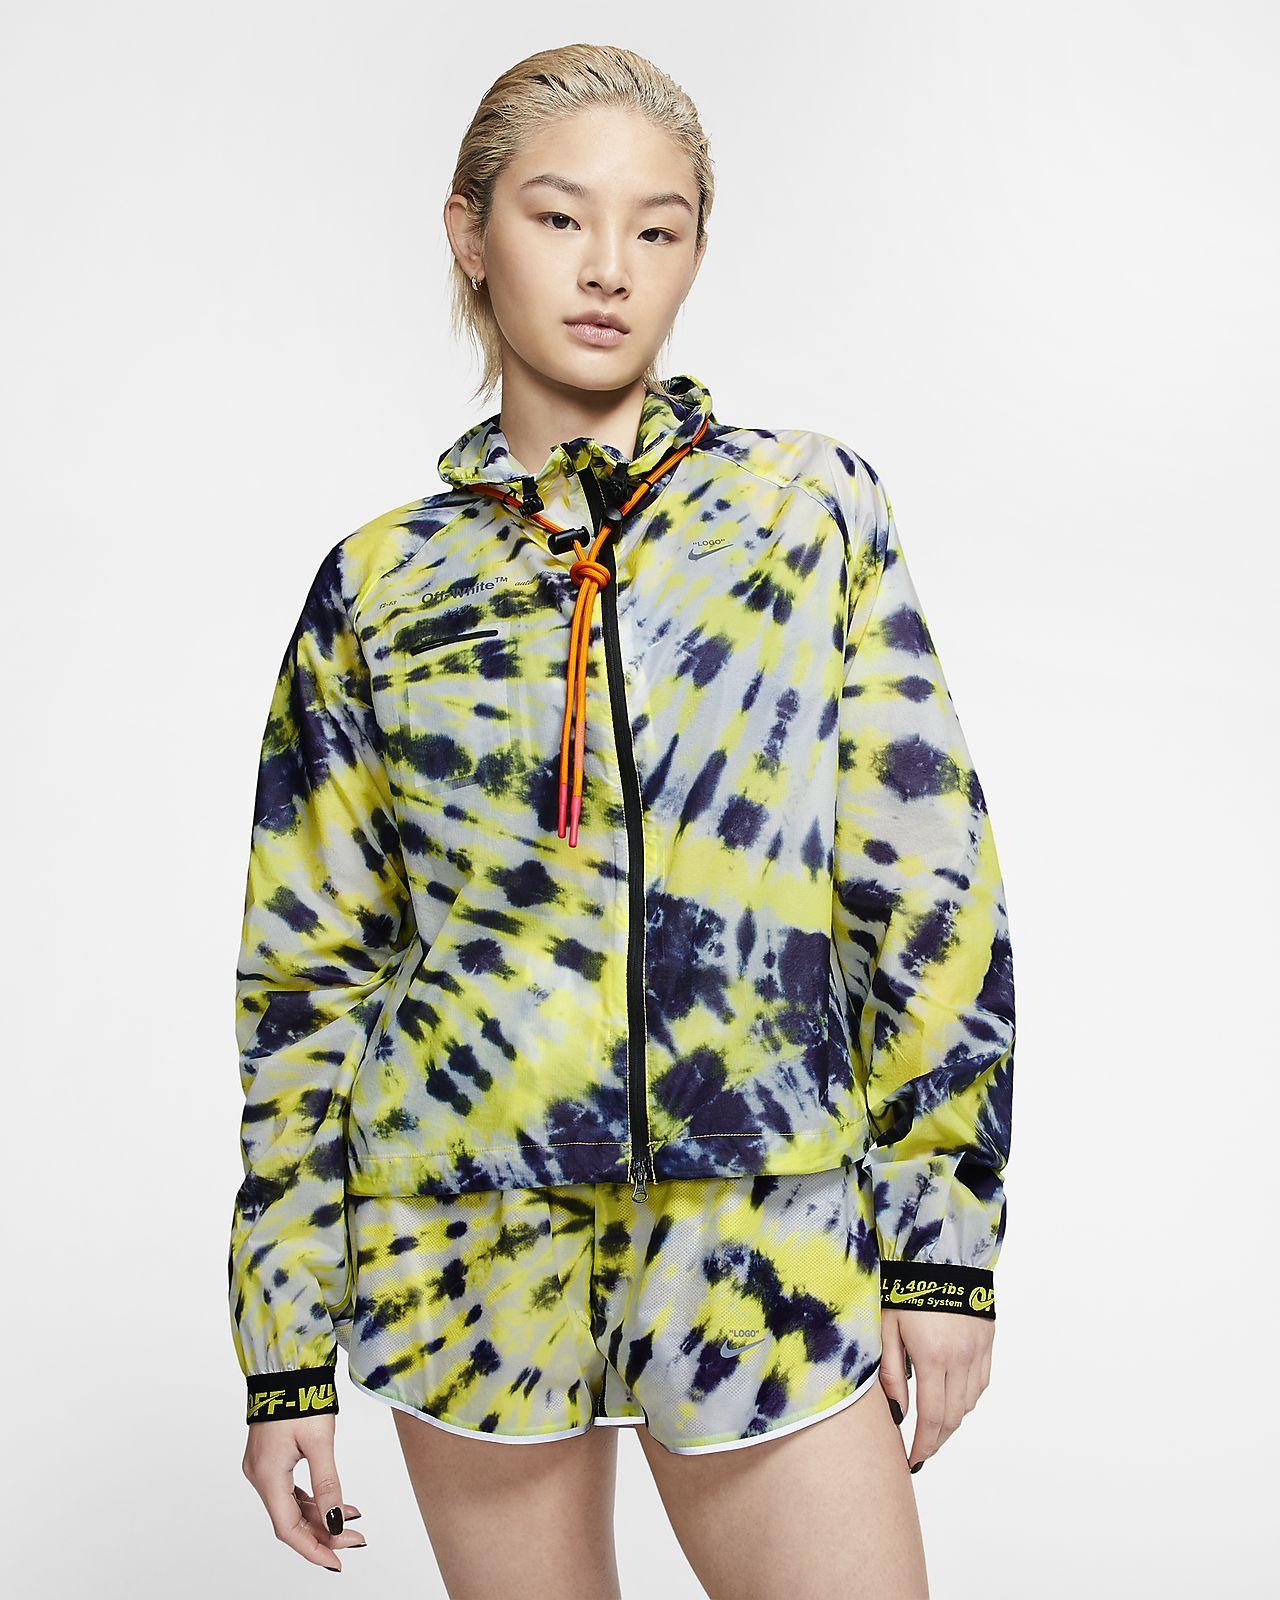 Chamarra con tie dye para mujer Nike x Off-White™